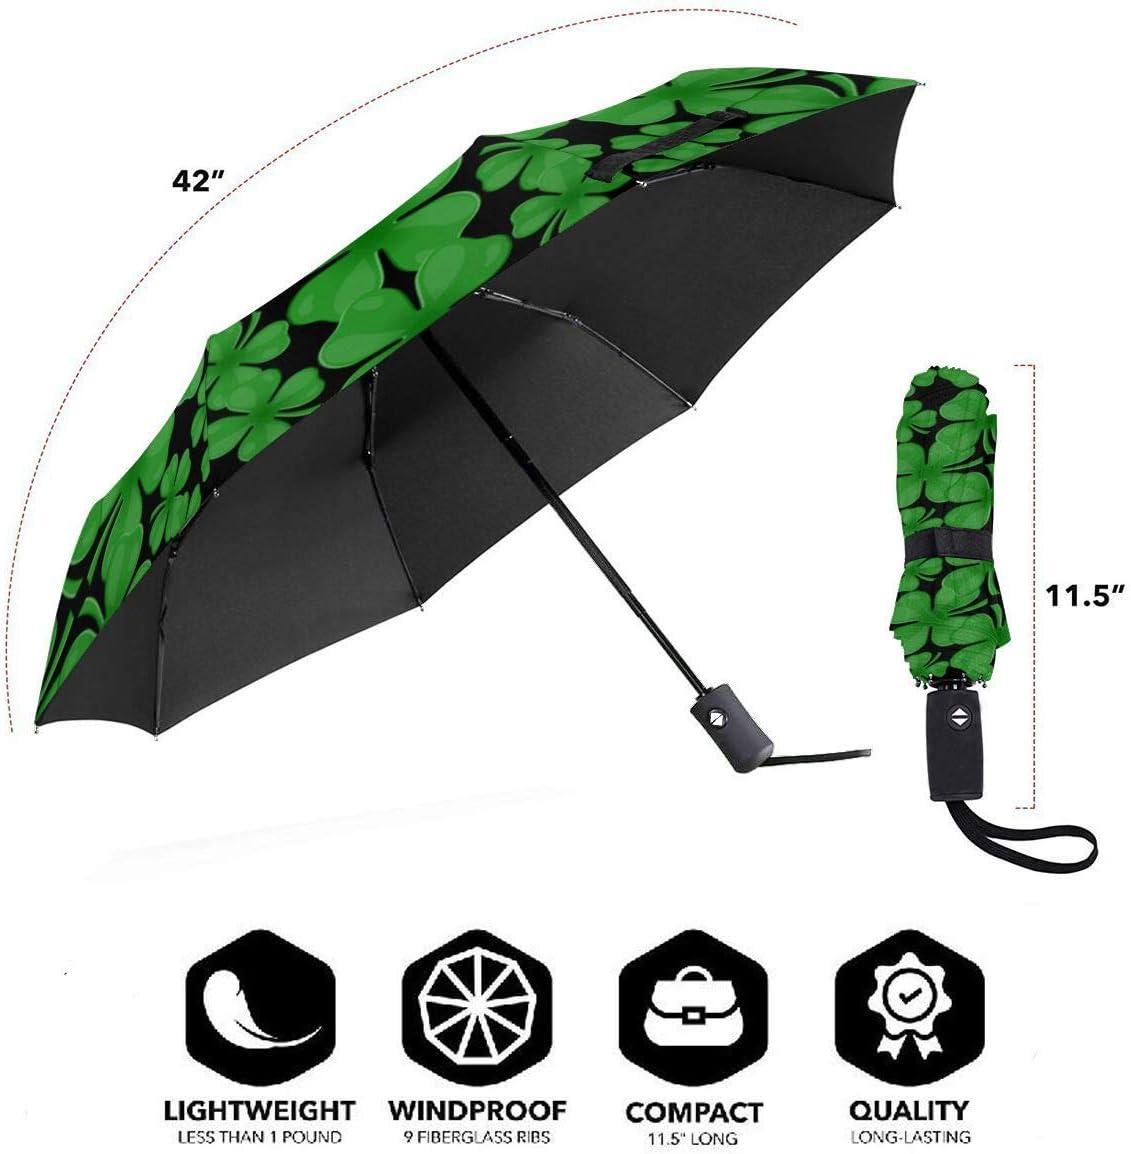 Four Leaf Clover Automatic Tri-Fold Umbrella Parasol Sun Umbrella Sunshade